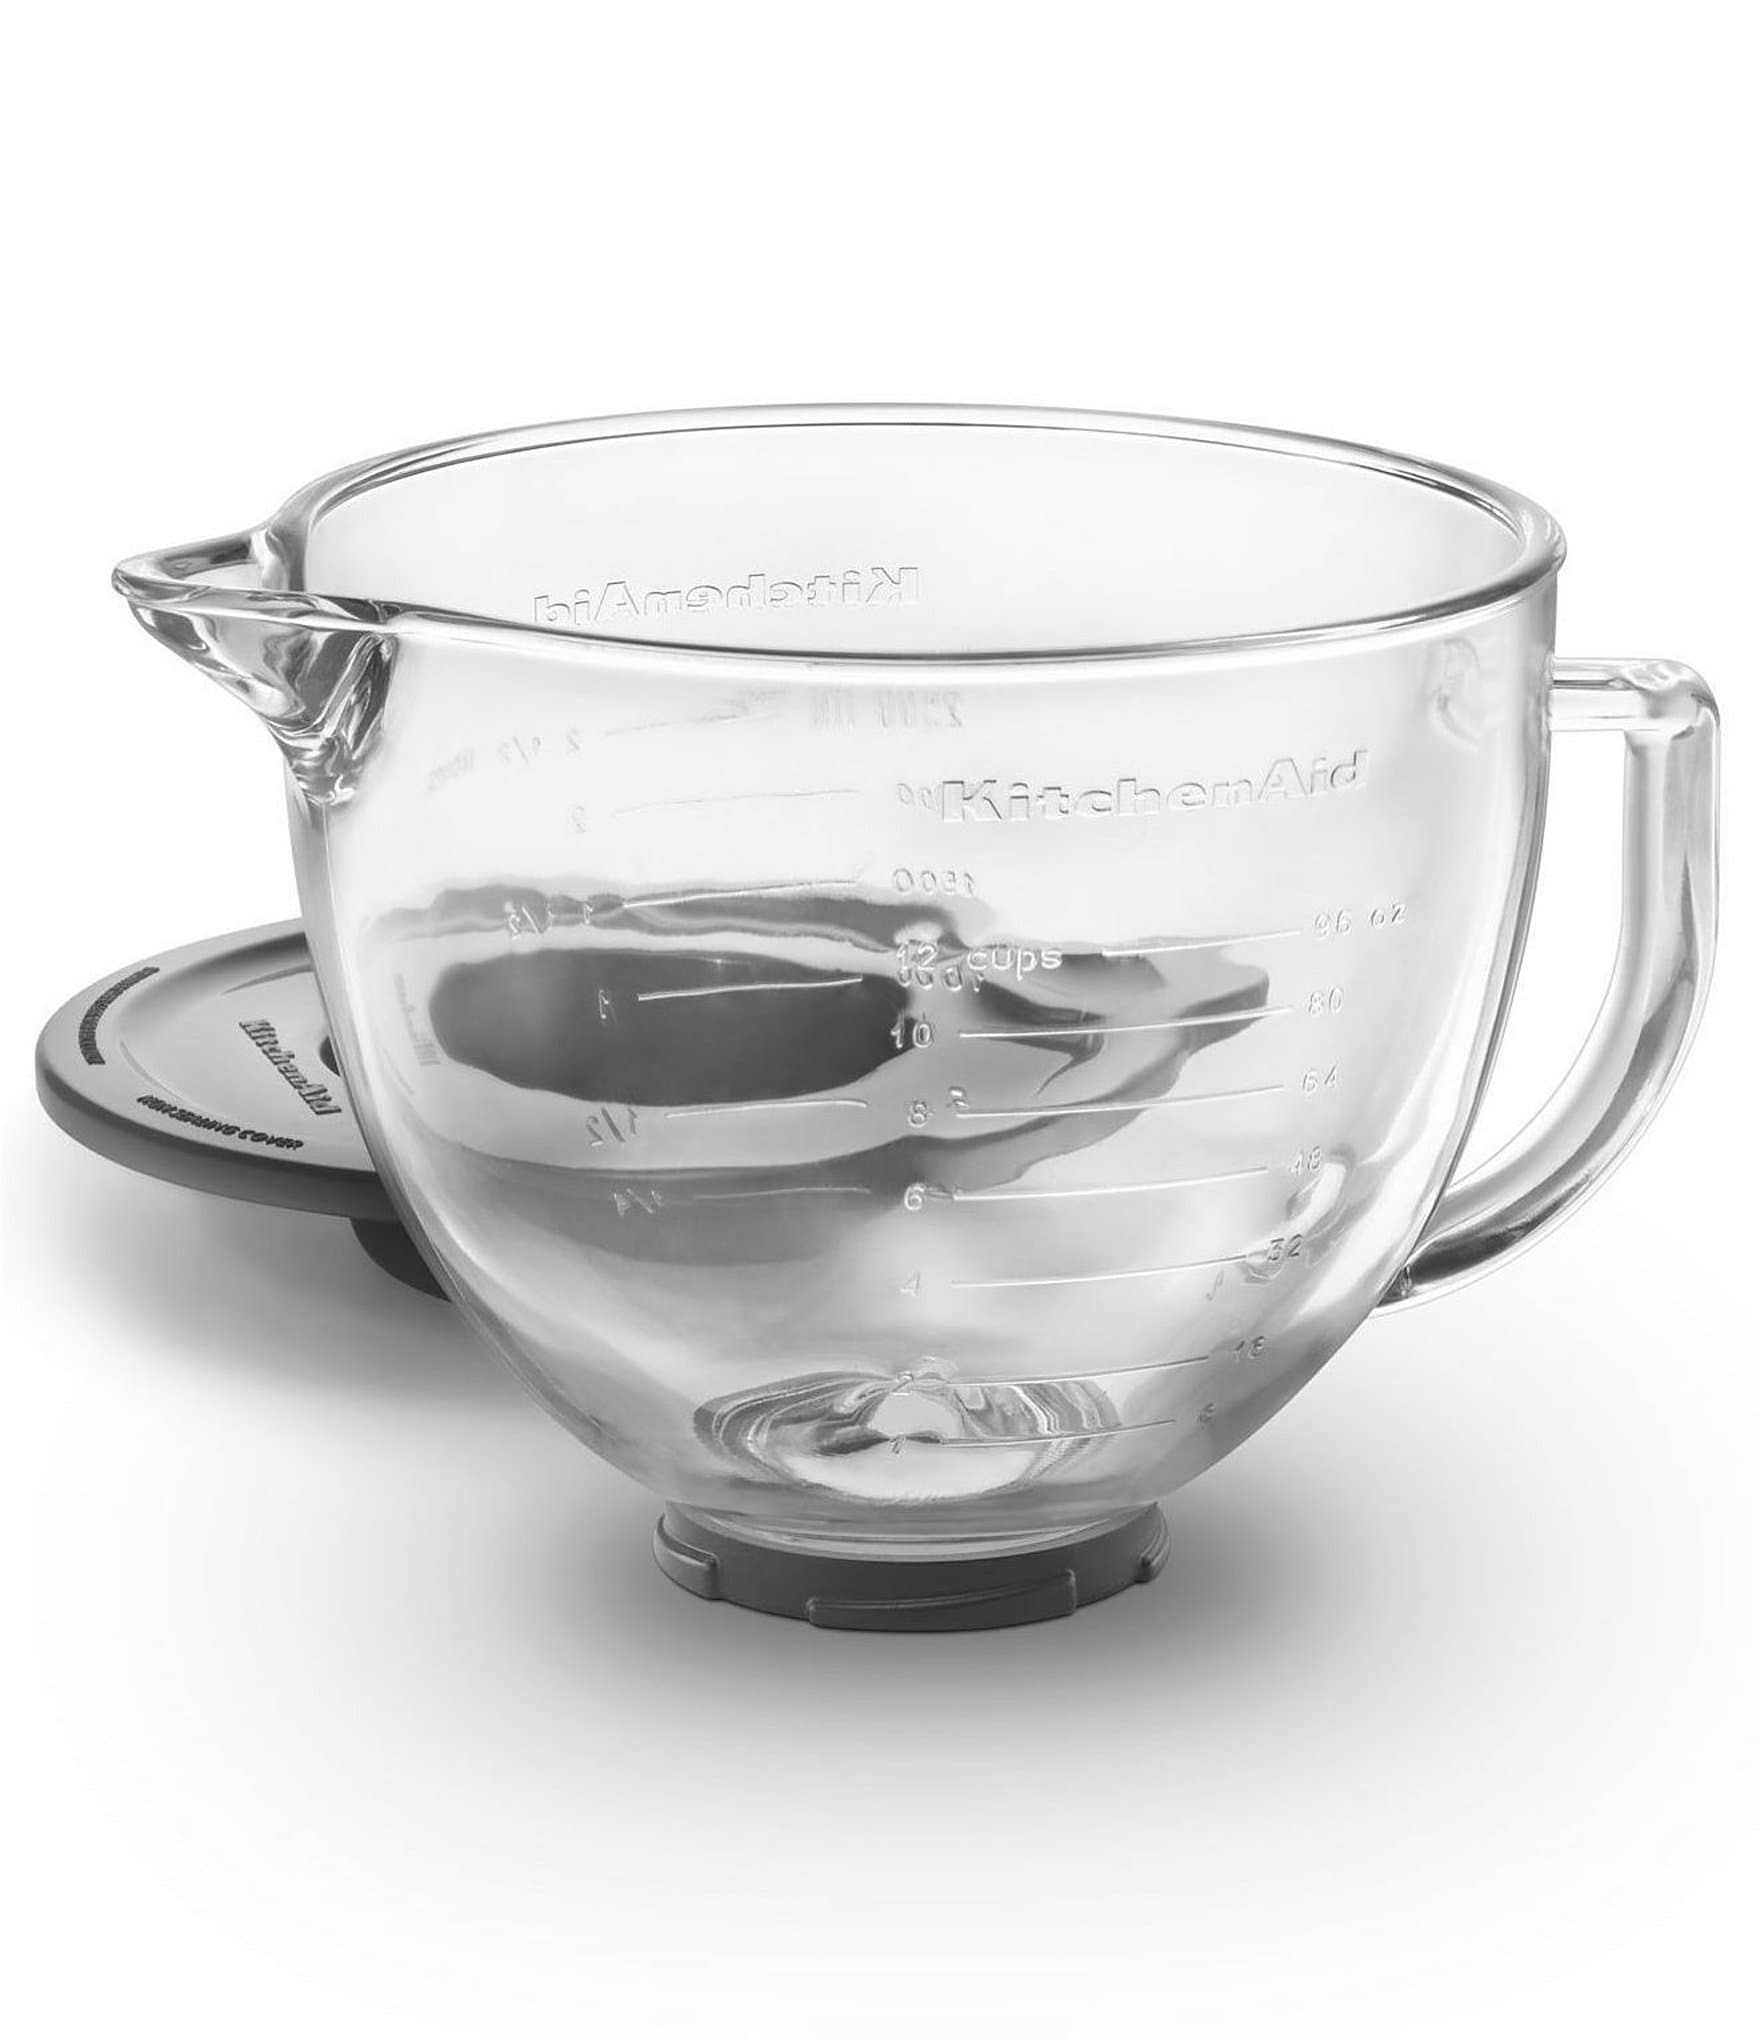 KitchenAid 5Quart Glass Bowl TiltHead Stand Mixer